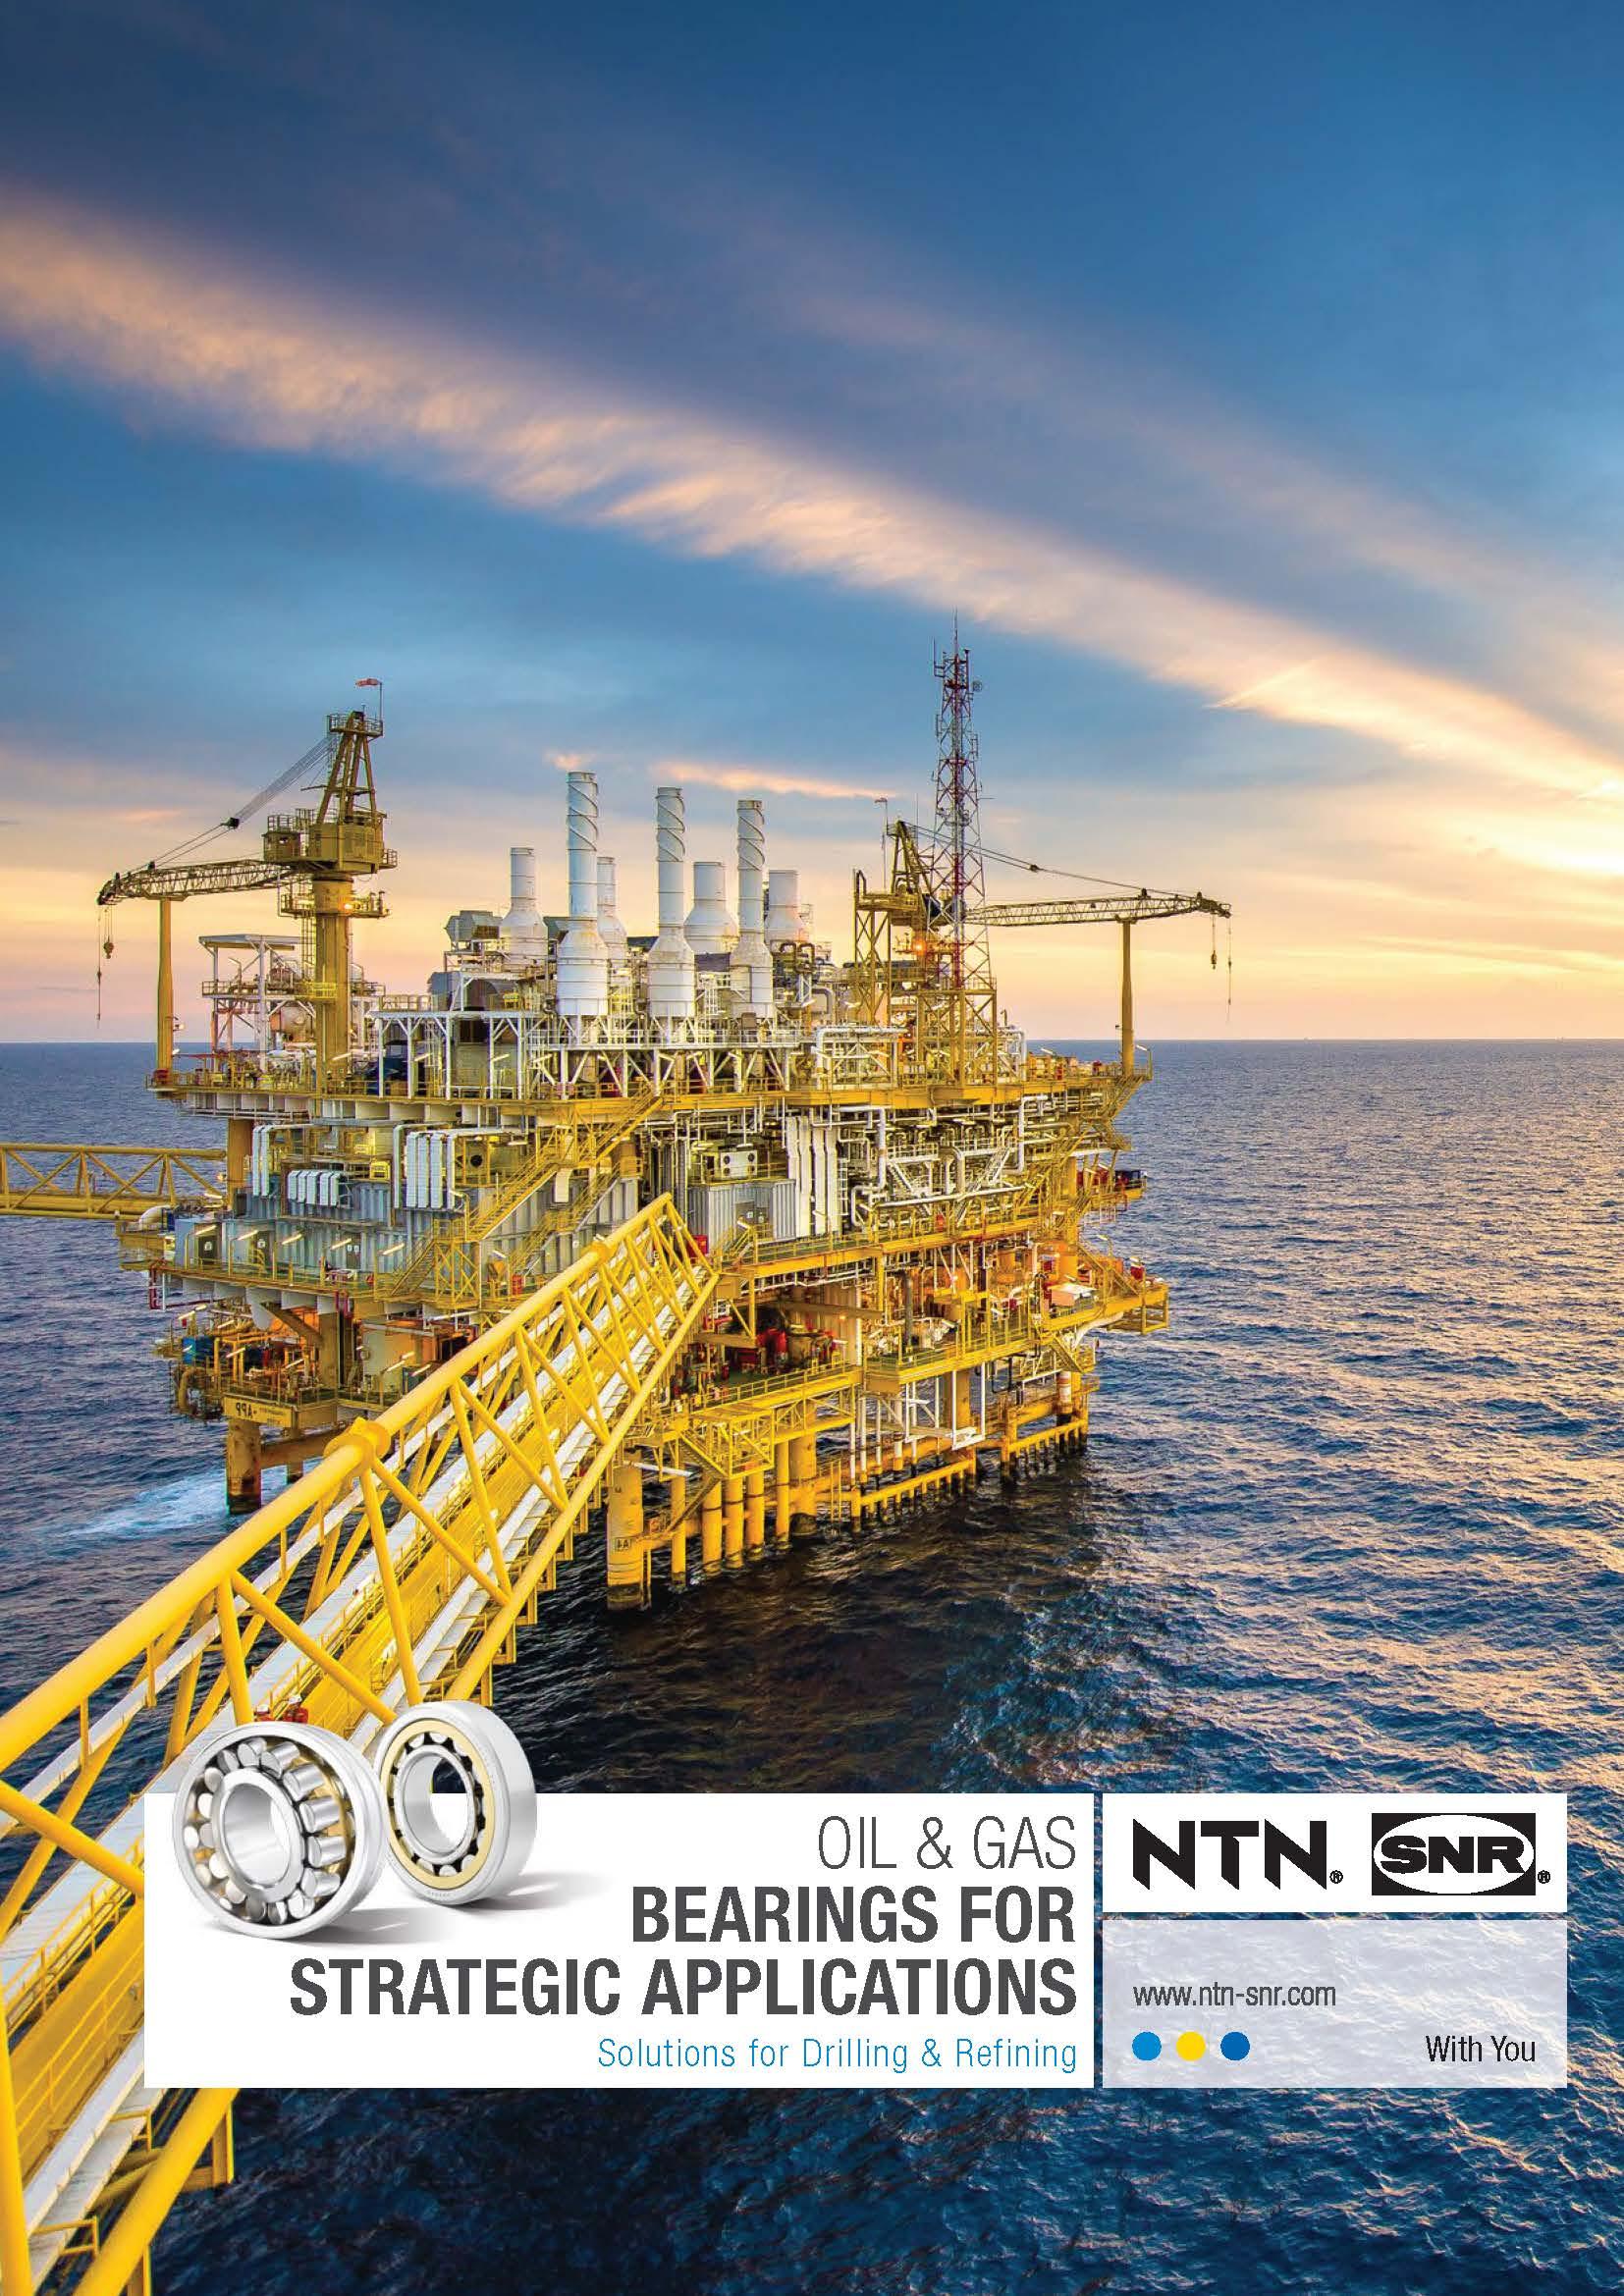 Cover-NTN SNR-Oil and Gas